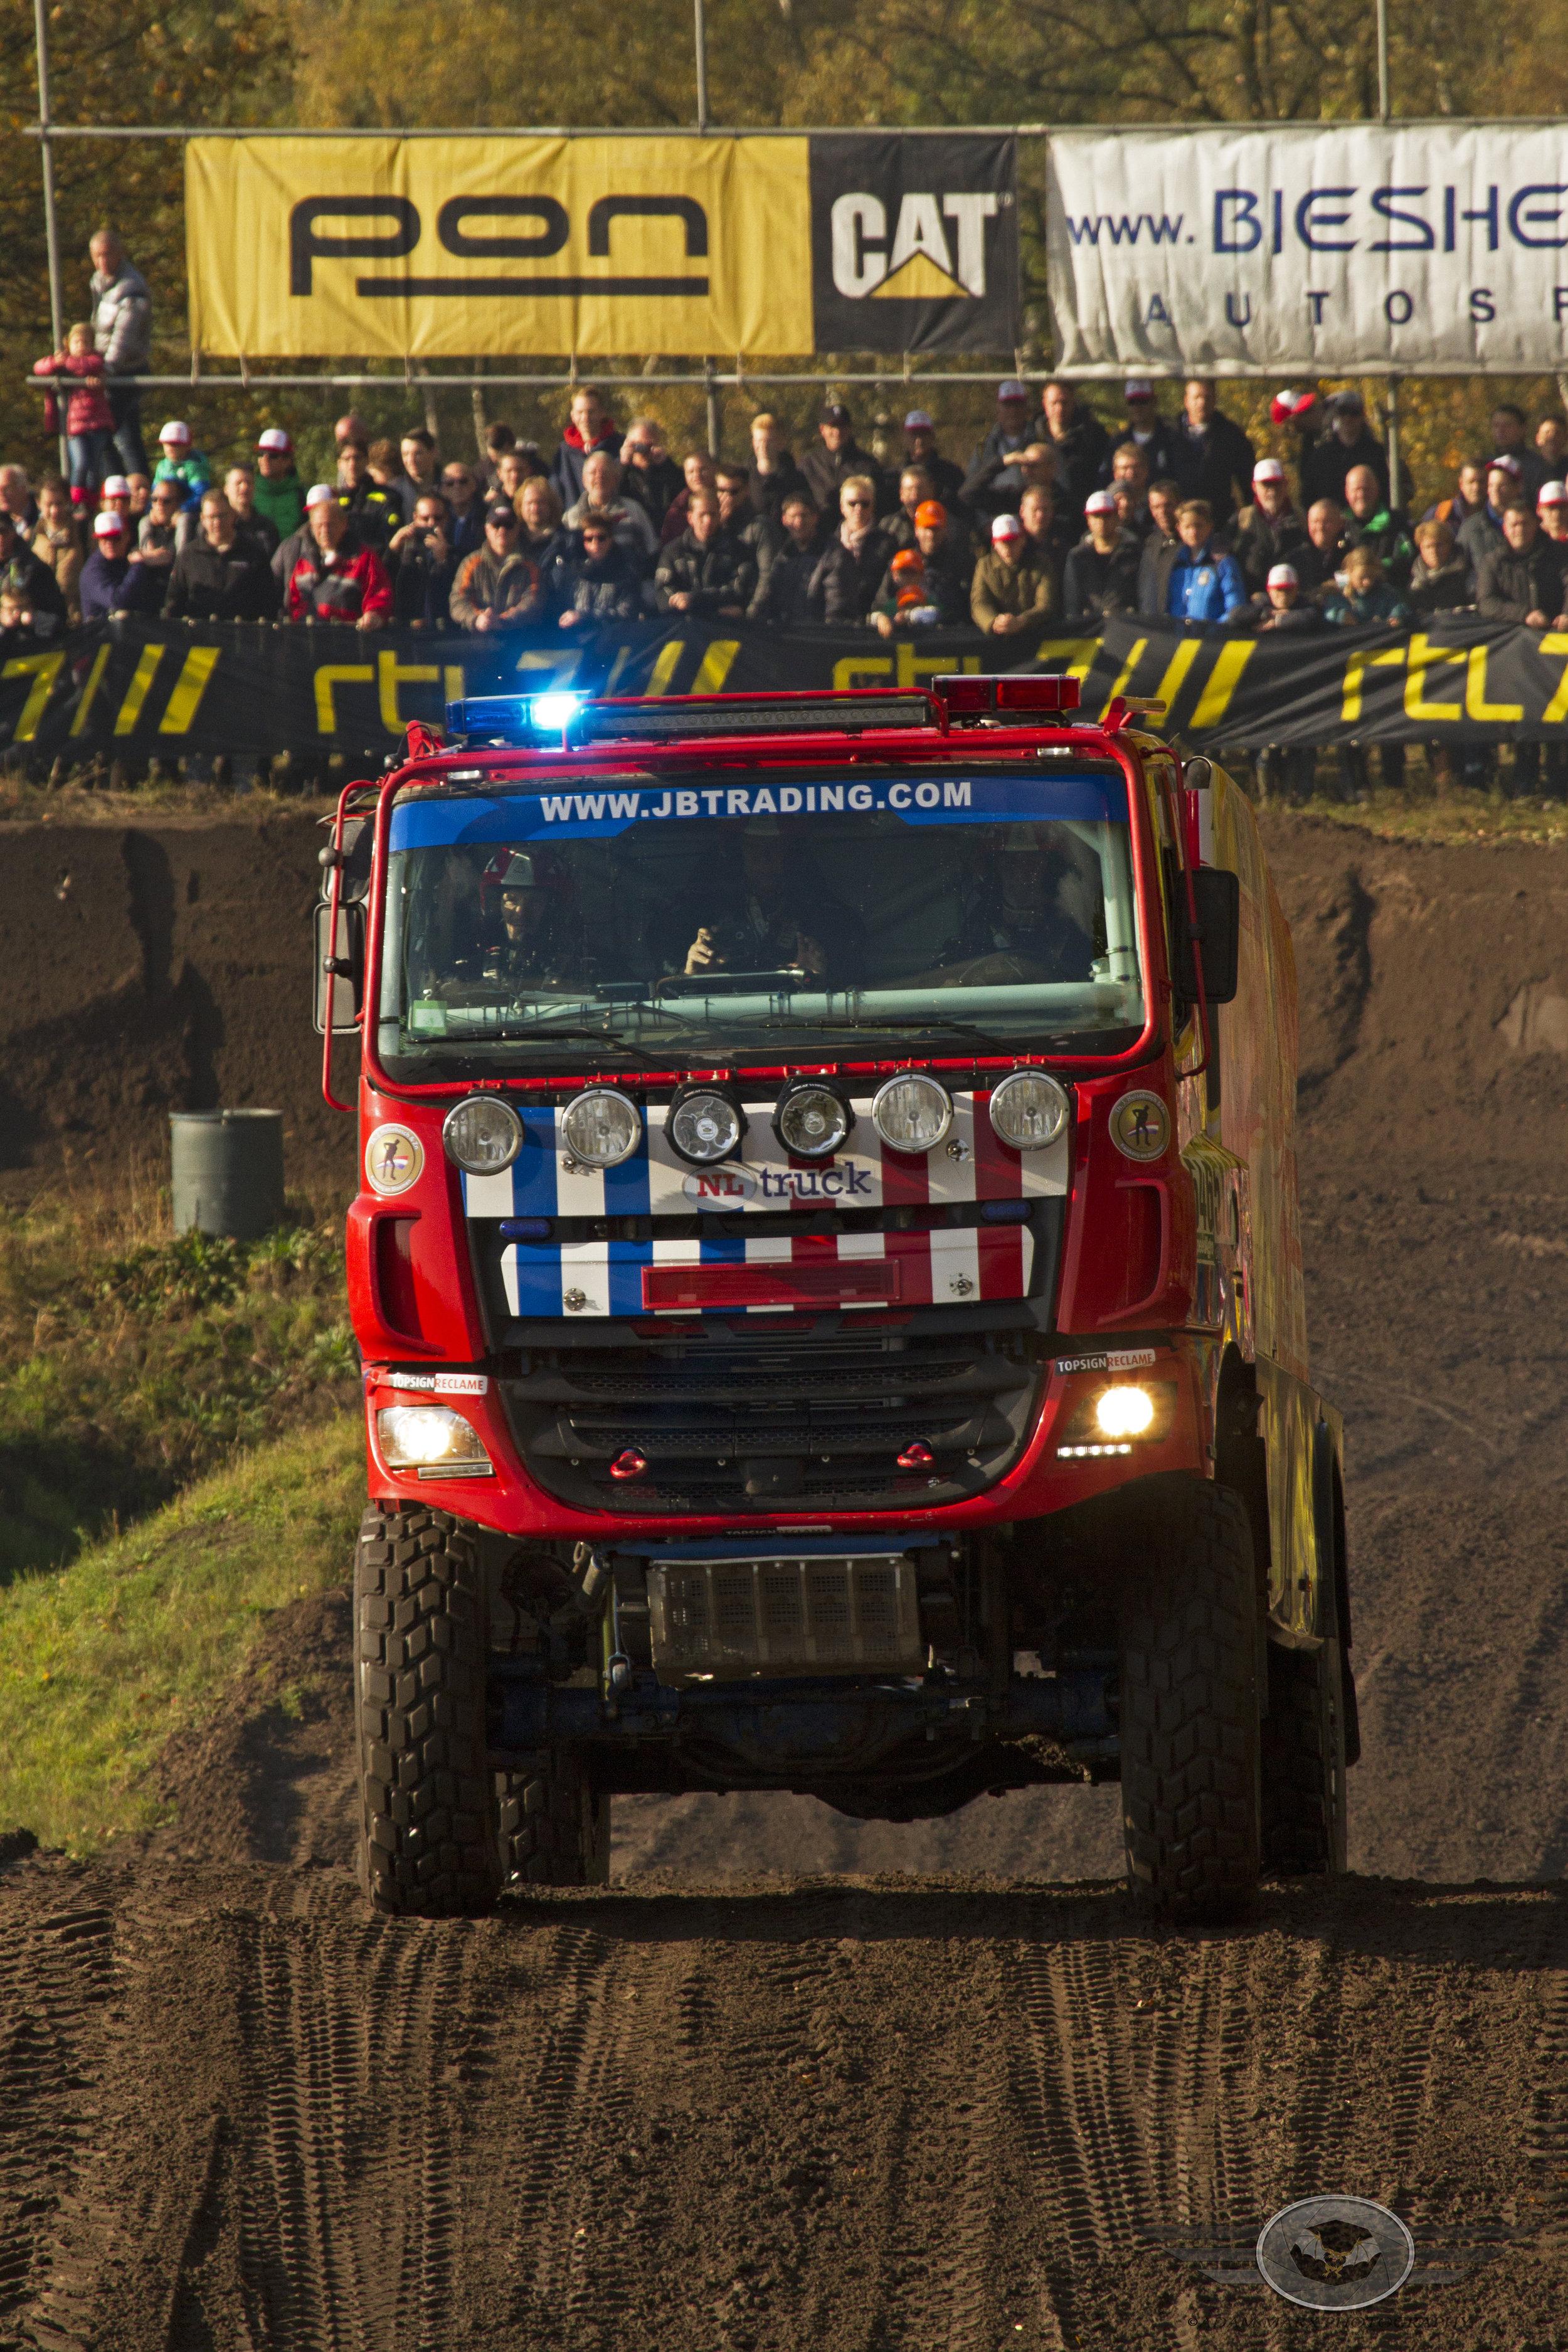 Blue lights on for Richard de Groot in his Dakar firetruck.